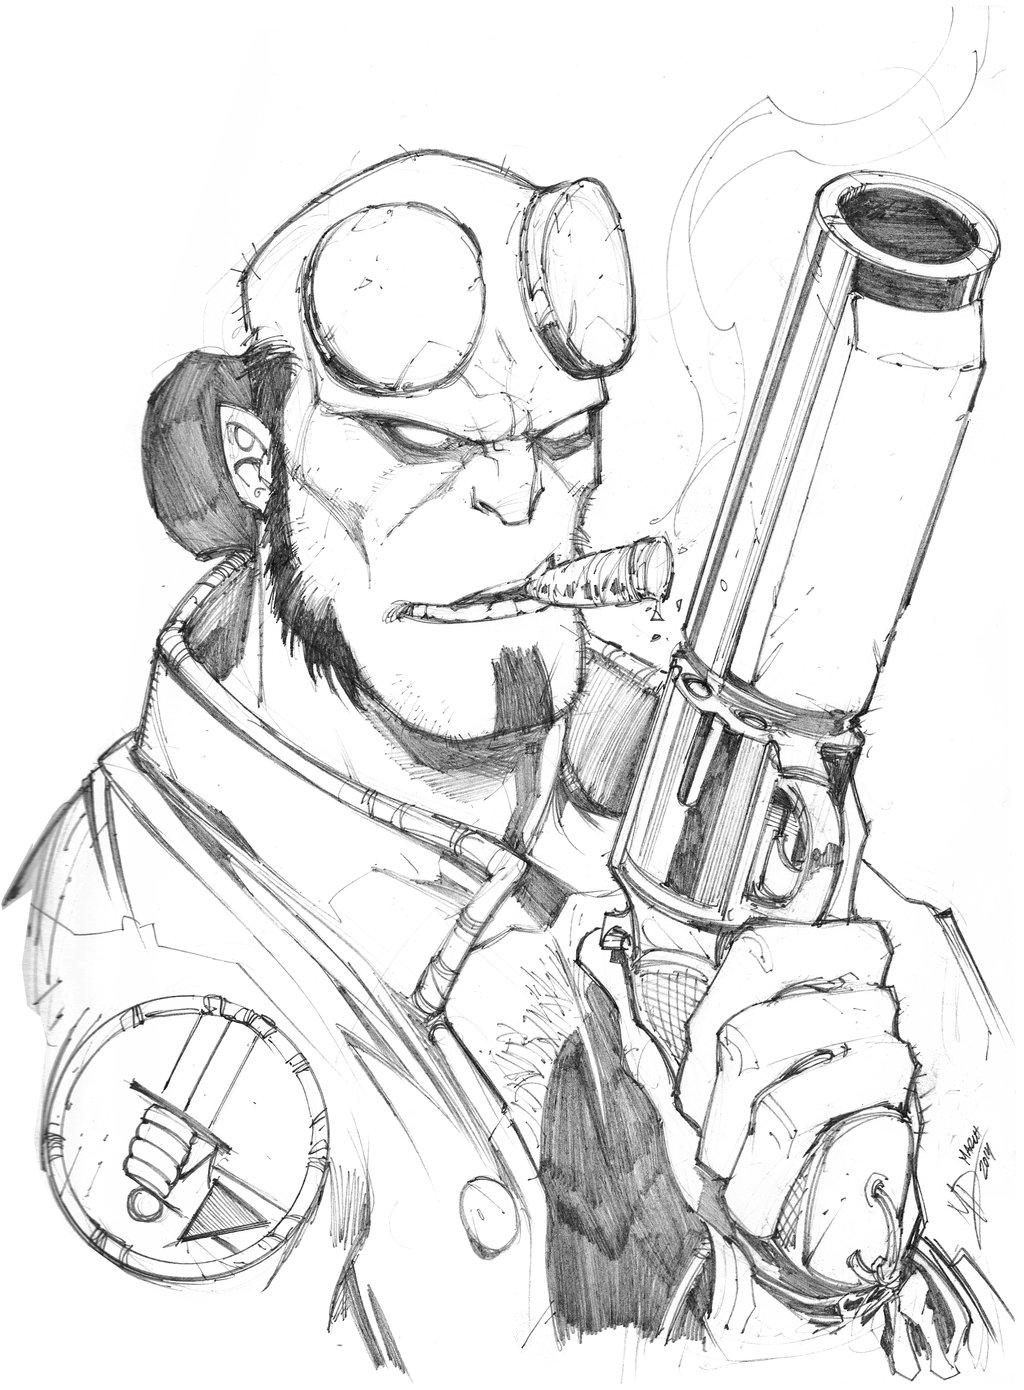 Max Drawing at GetDrawings.com | Free for personal use Max Drawing ...